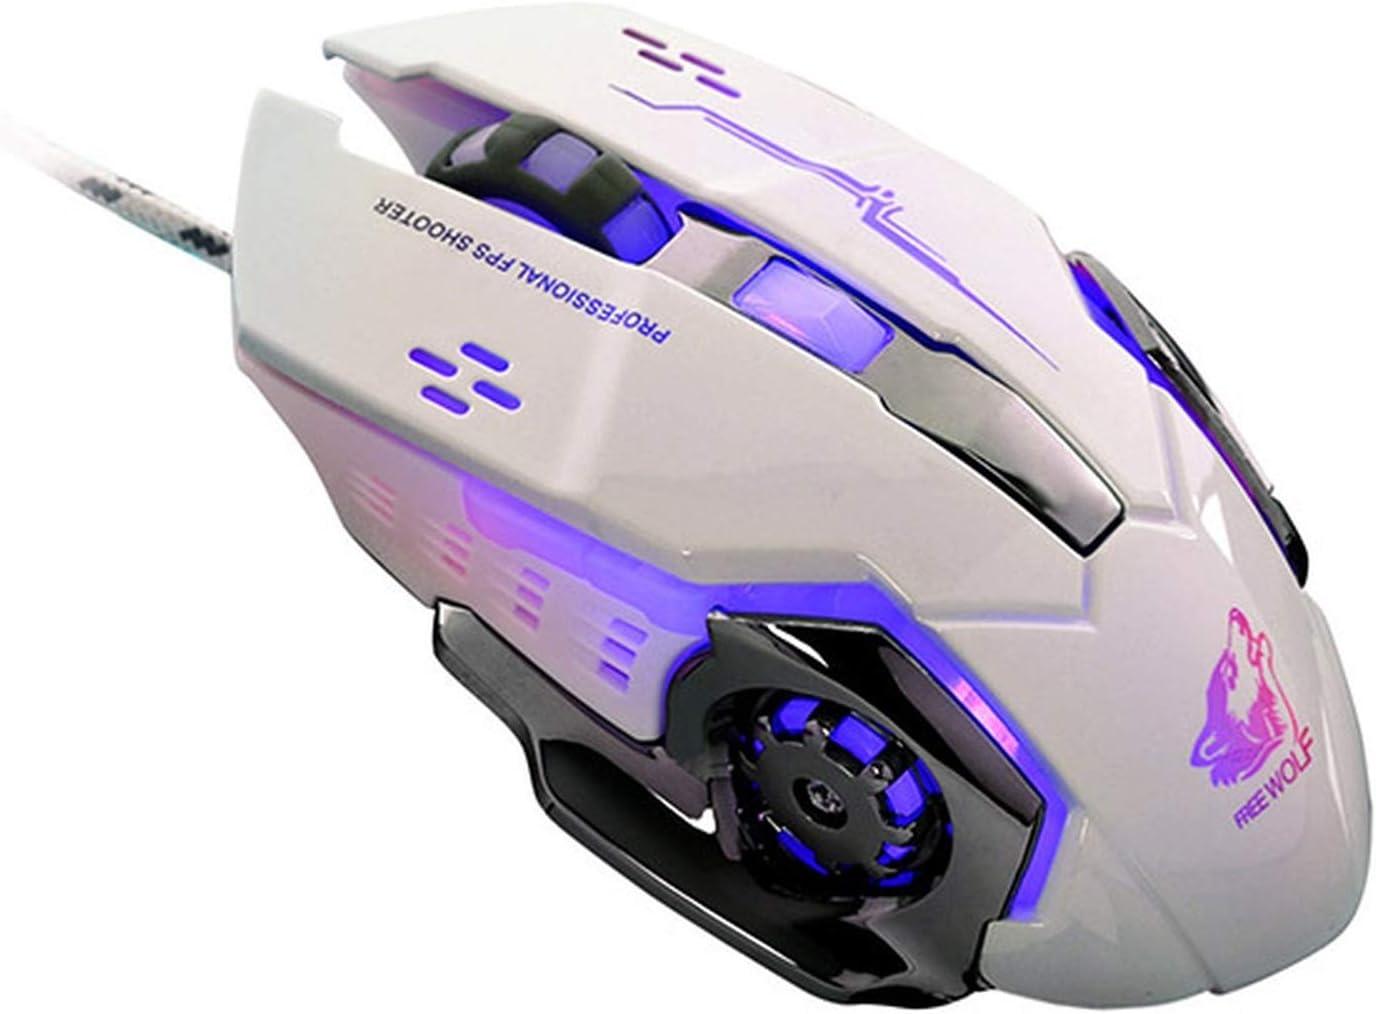 Wired LED Light 4000DPI Optical USB Ergonomic Pro Gamer Gaming Mouse Metal Plate Game Pro Gamer Computer Mice,bla,